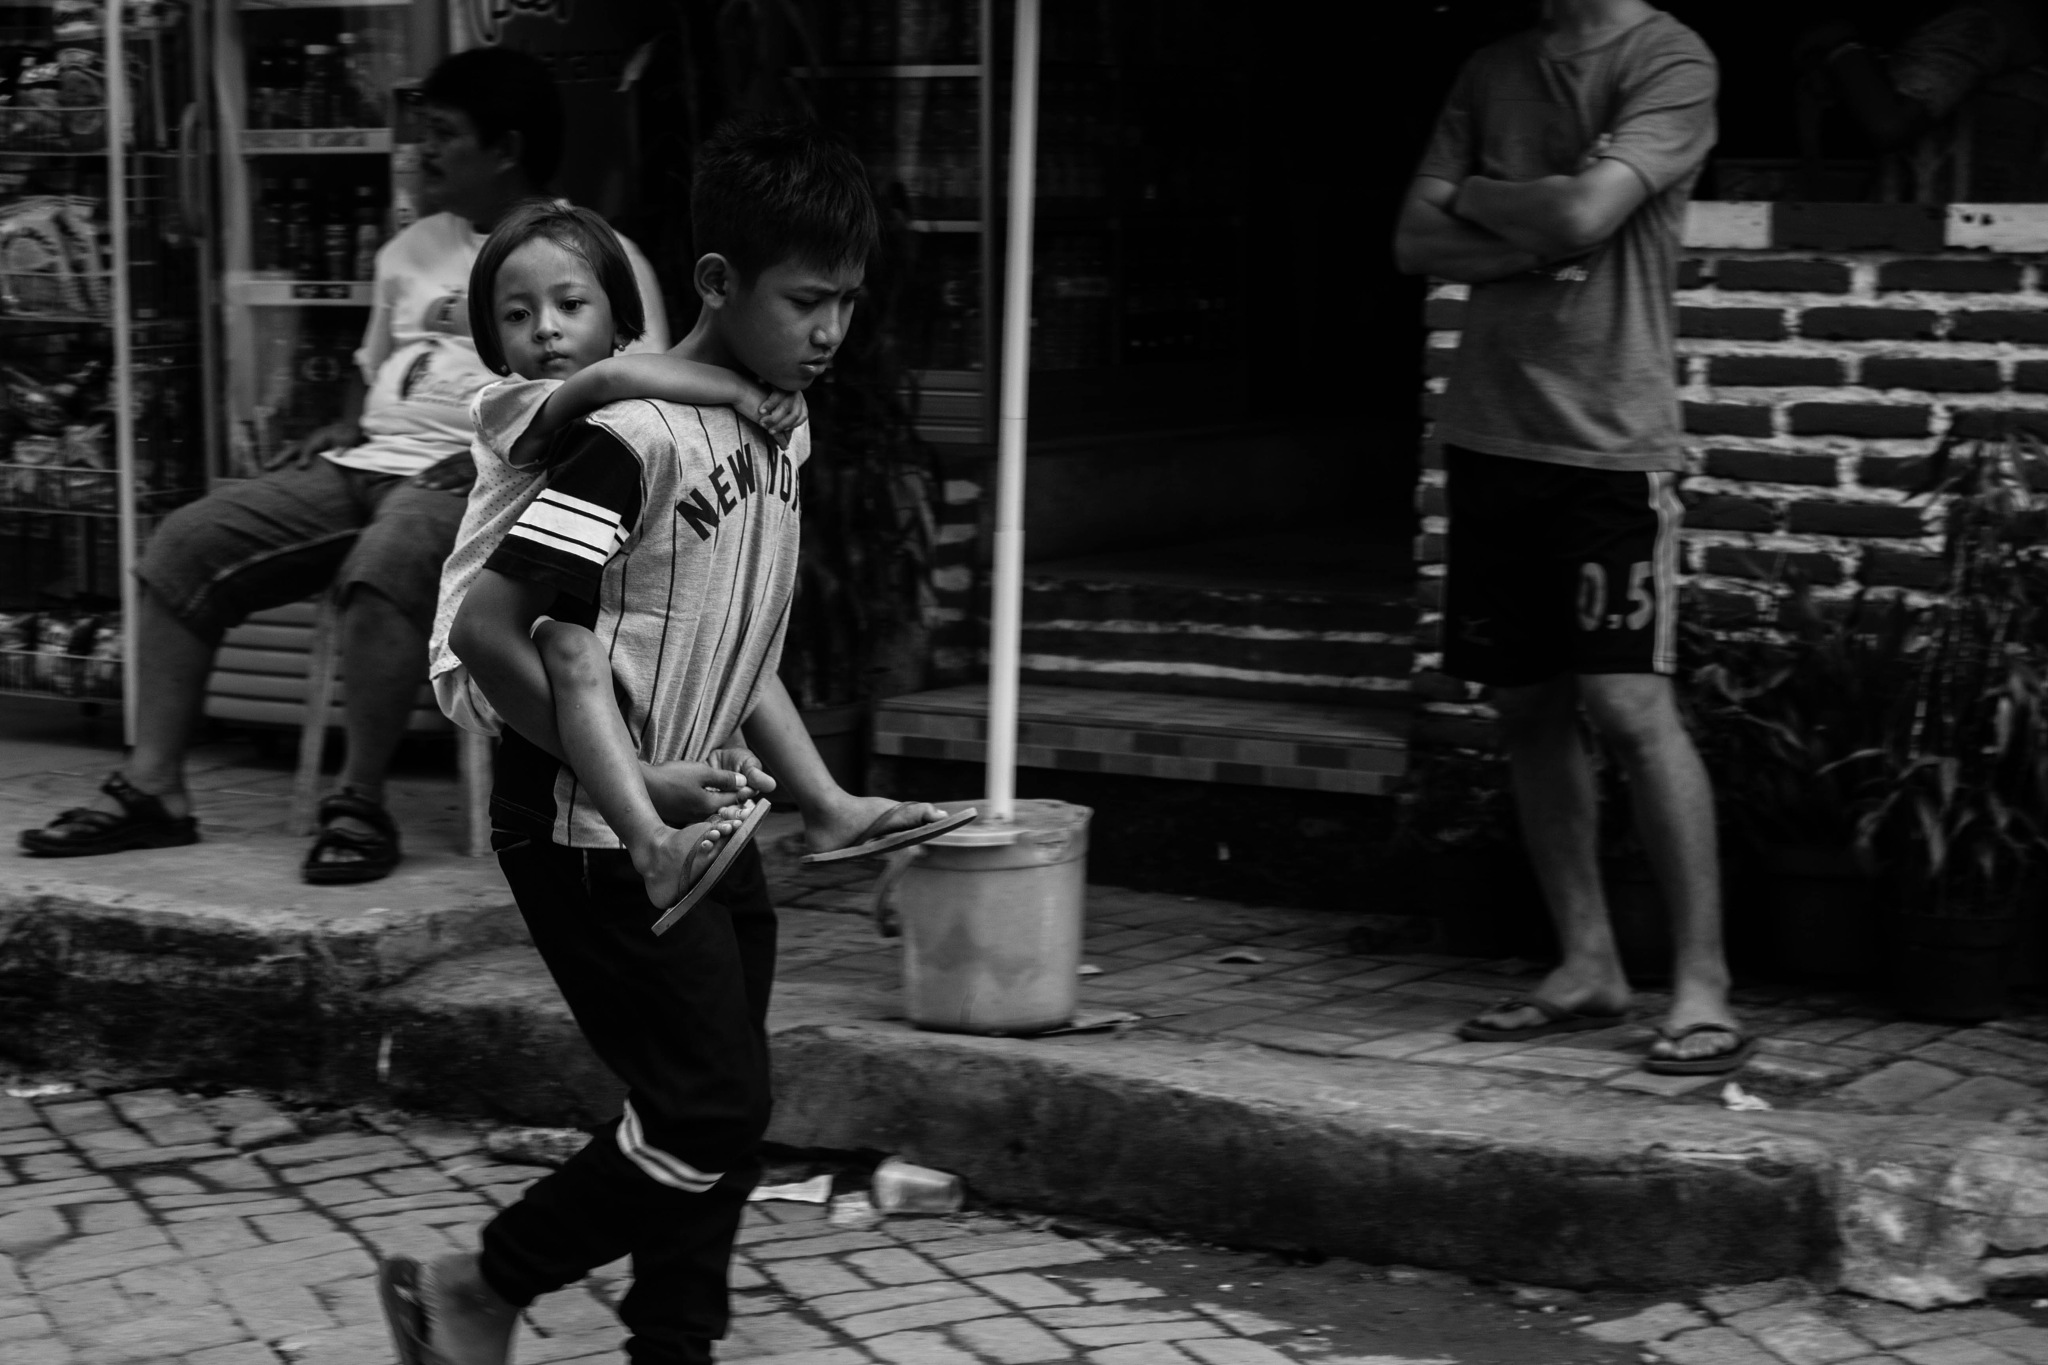 Run for family by amriyy